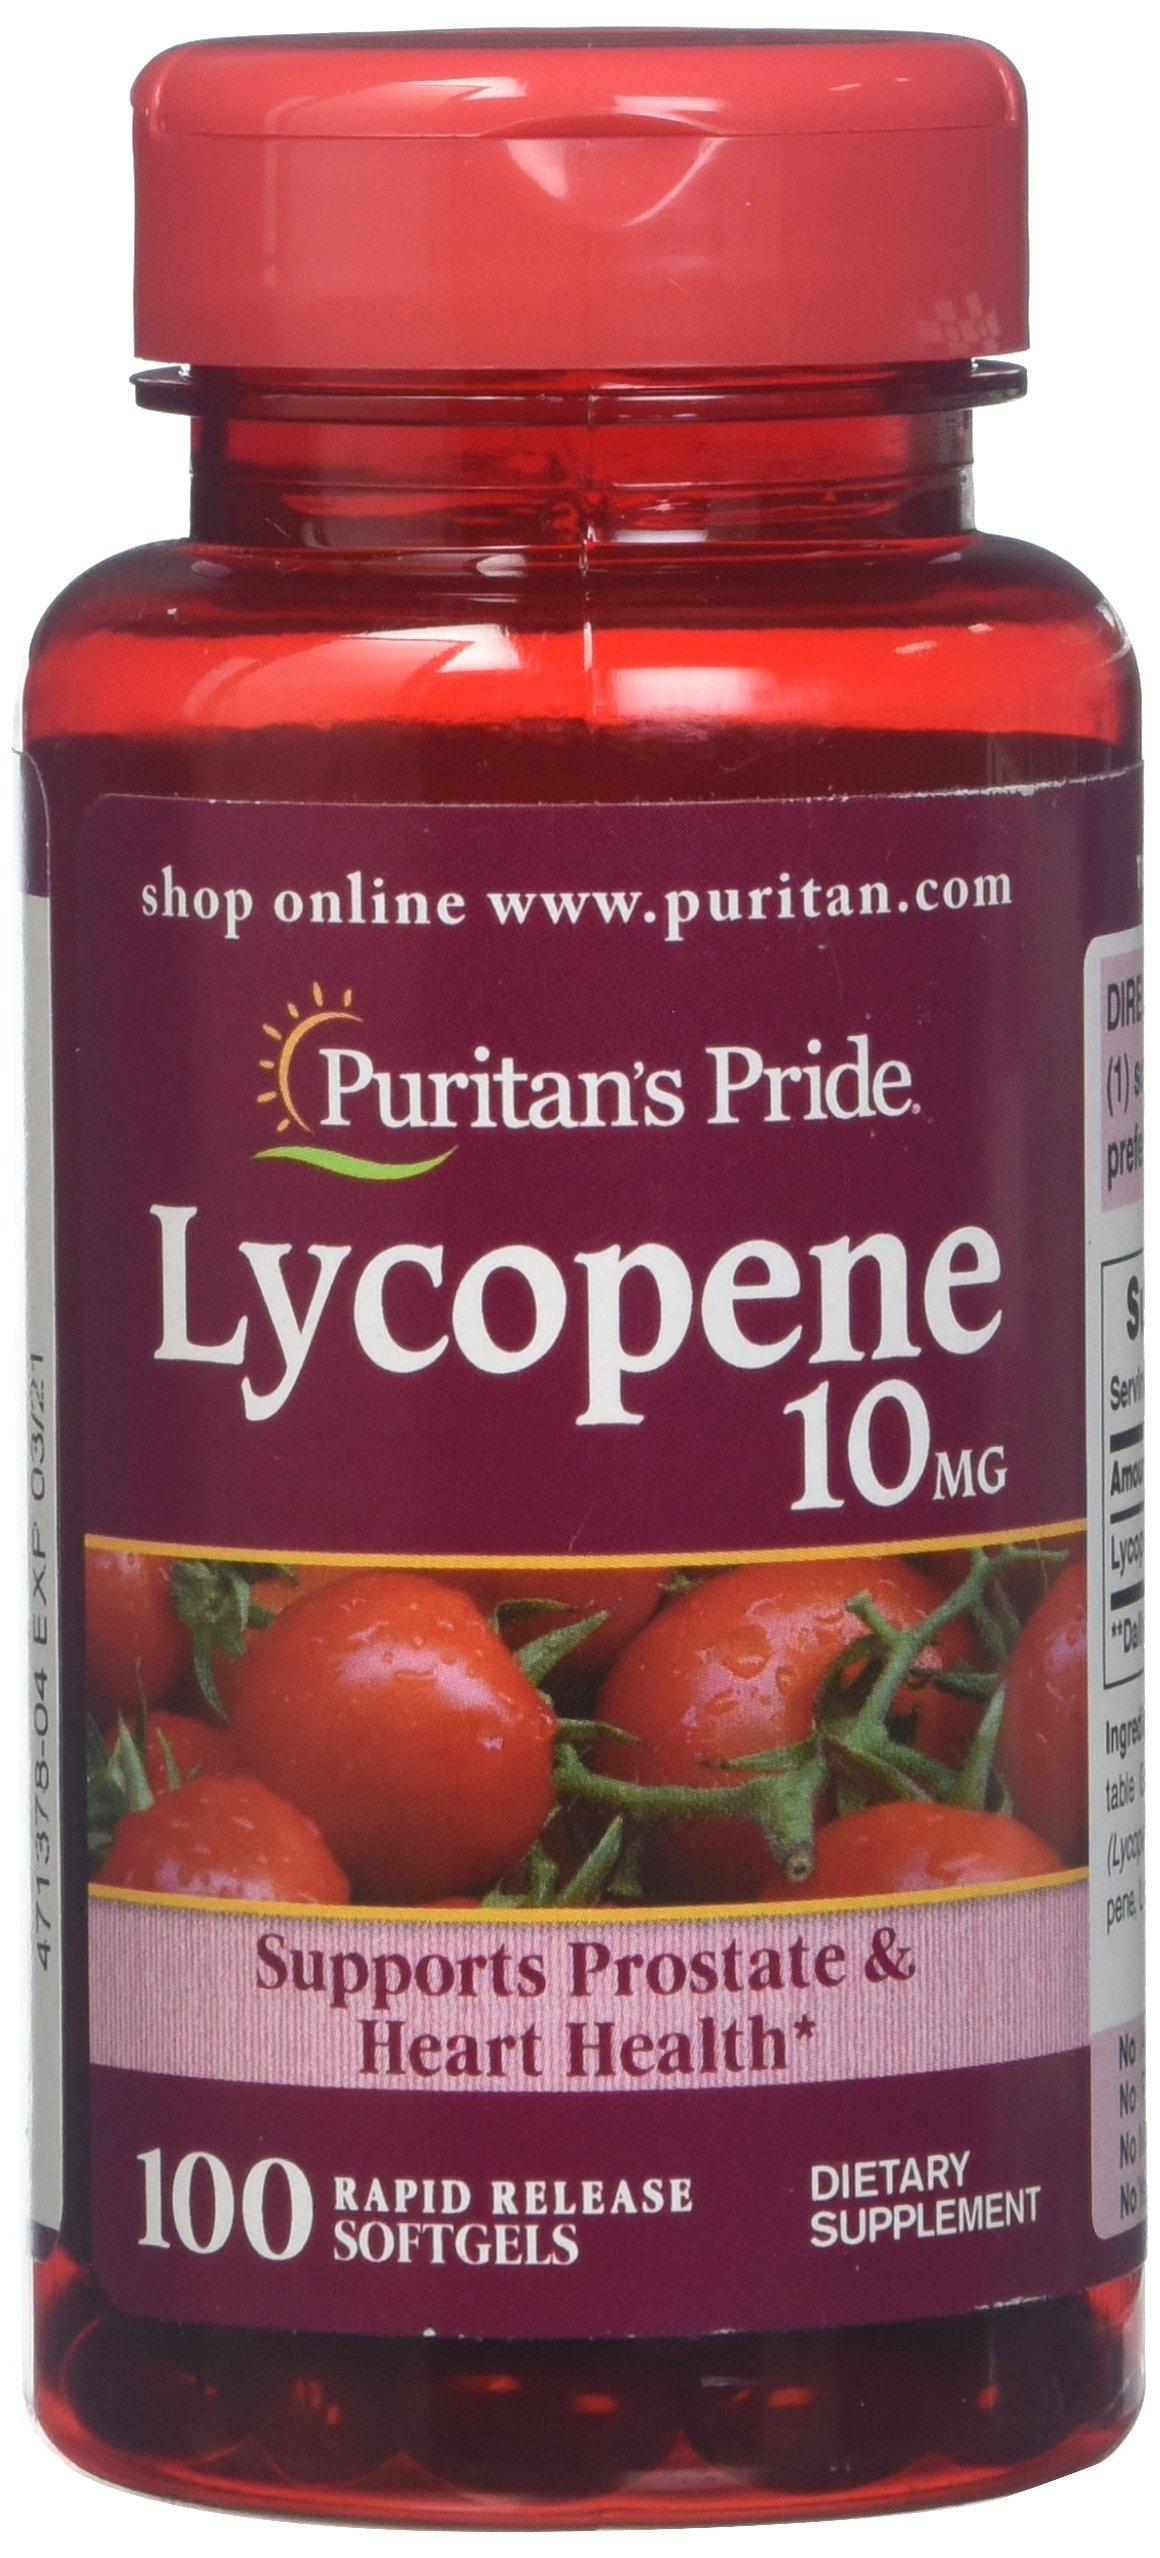 Puritan's Pride Lycopene 10 mg-100 Softgels